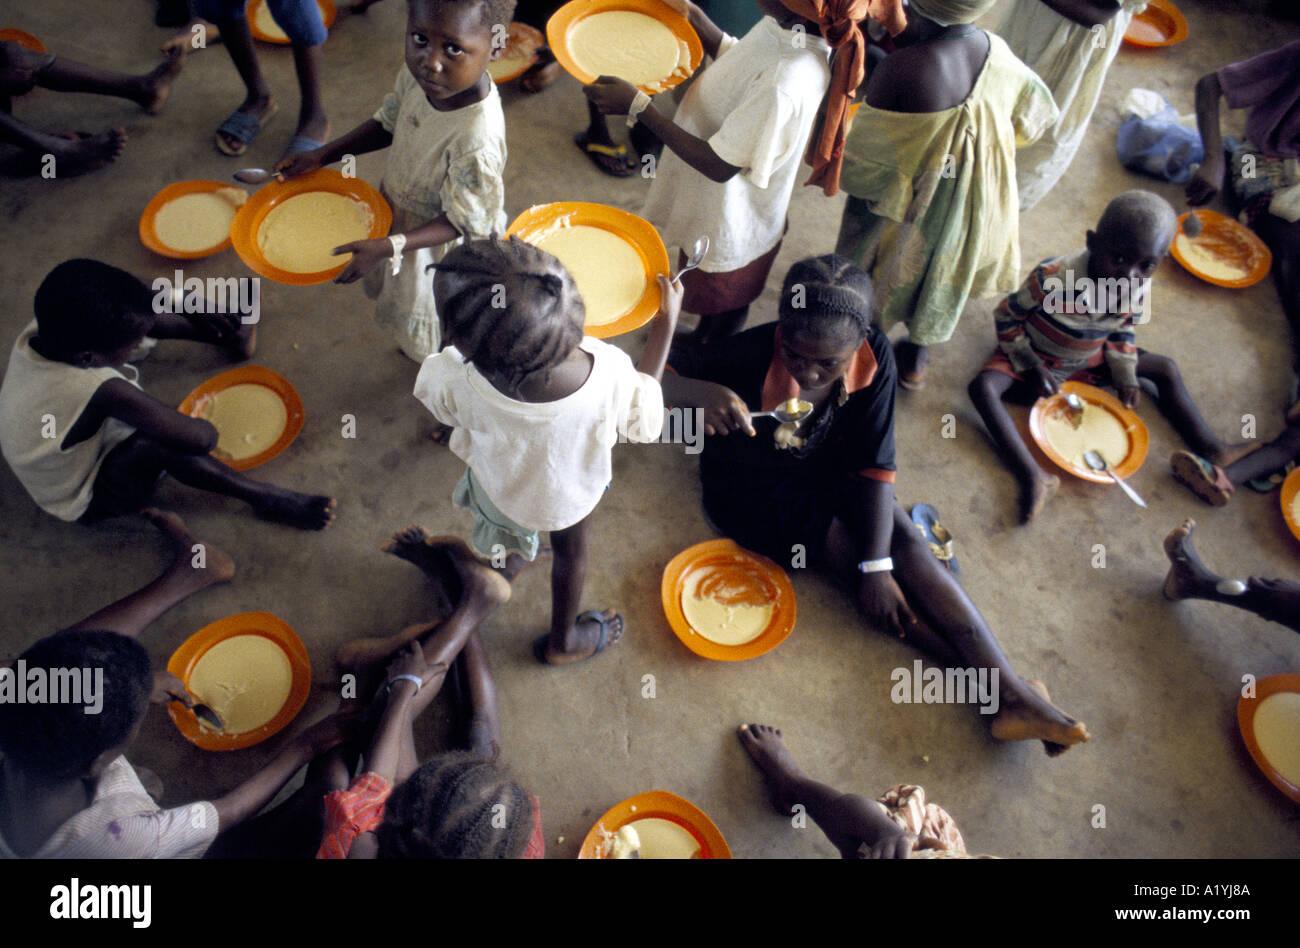 LIBERIA REFUGEES OCT 1996 OXFAM FEEDING CENTRE AT SINJE LIBERIA 1996 - Stock Image